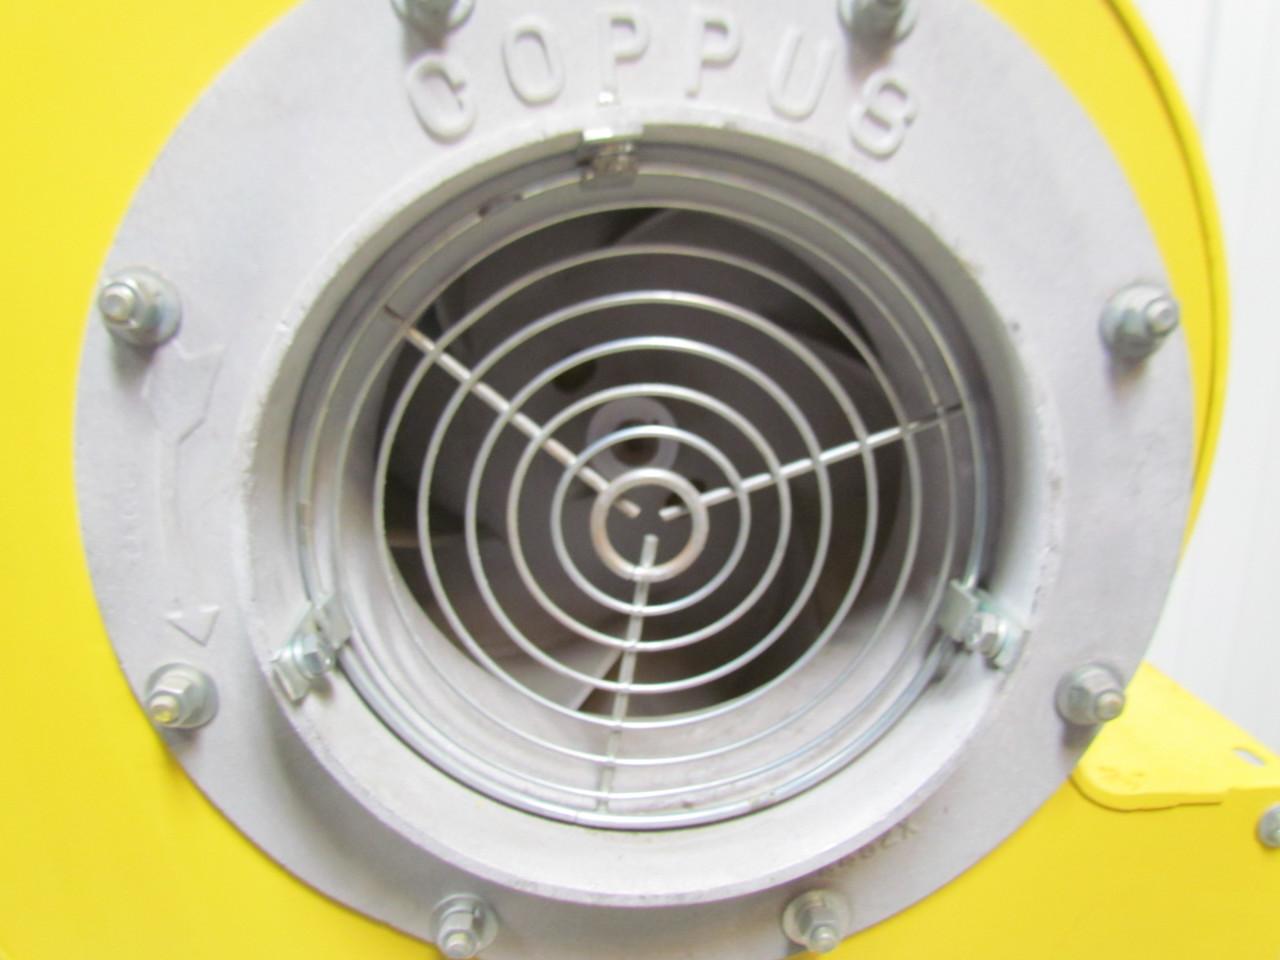 Details about Coppus High Pressure Centrifugal Blower Exhaust 2500CFM  #BEAD0D